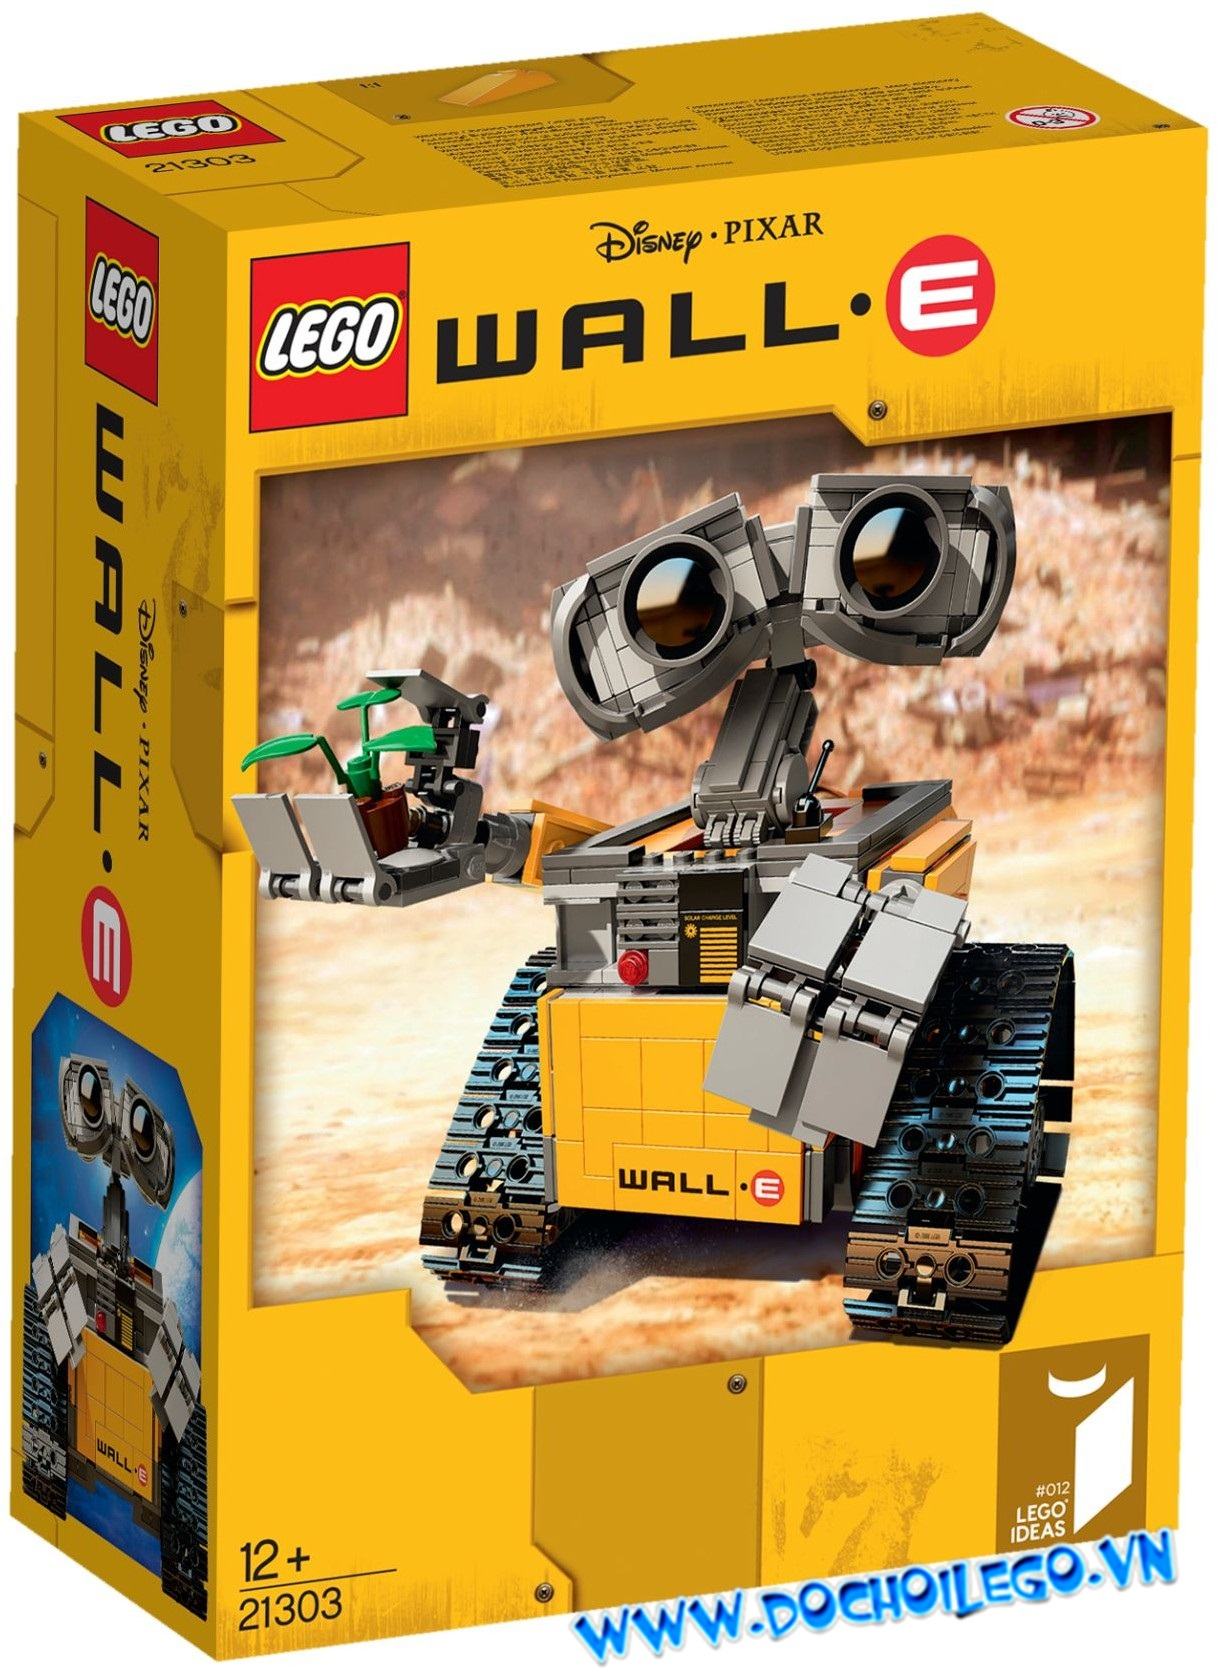 21303 LEGO® Ideas WALL•E